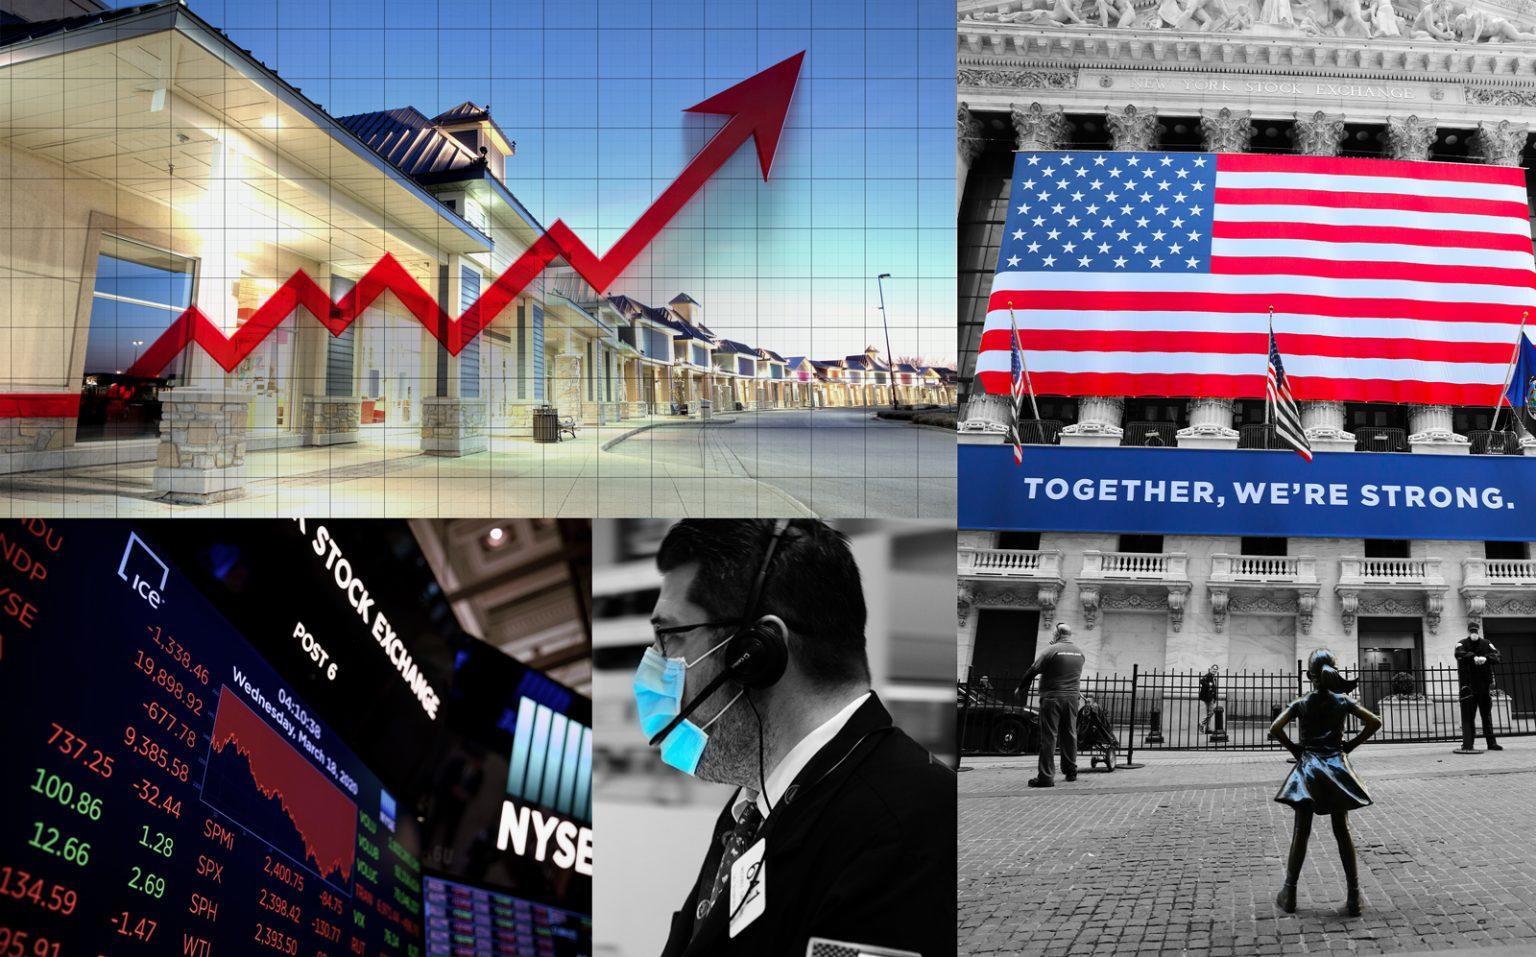 https://anysizedealsweek.com/wp-content/uploads/2020/05/reit-stocks-rise-NYSE-trading-floor-opens-1536x957-1.jpg